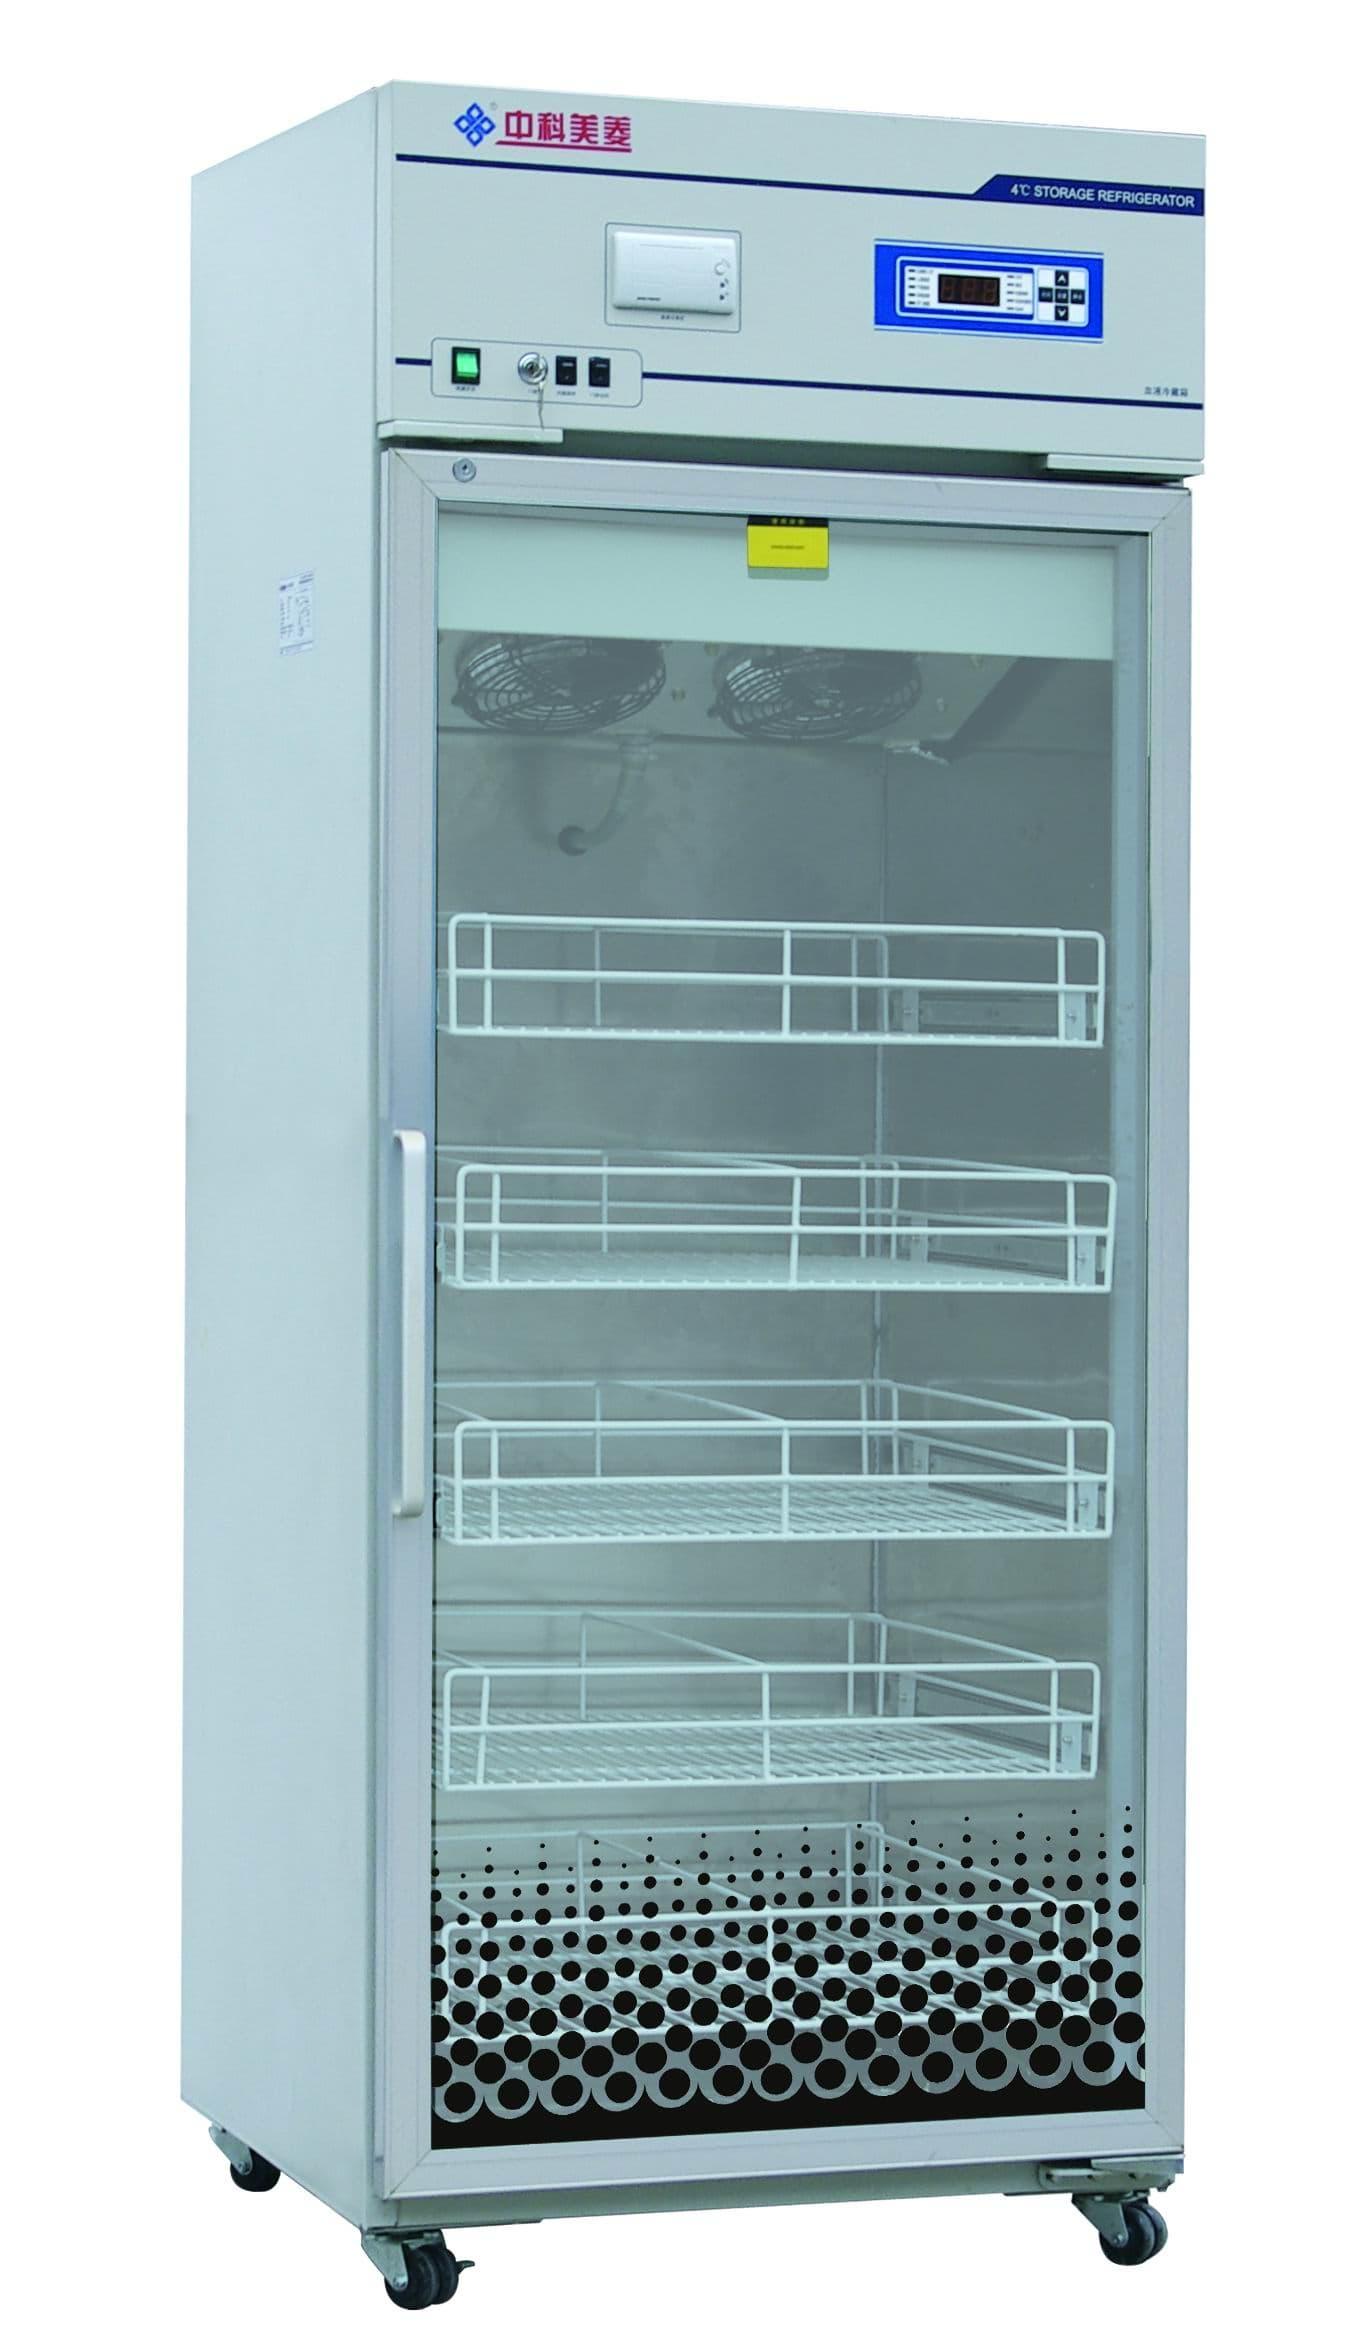 Sell My Car Online Free >> Blood bank refrigerator | tradekorea